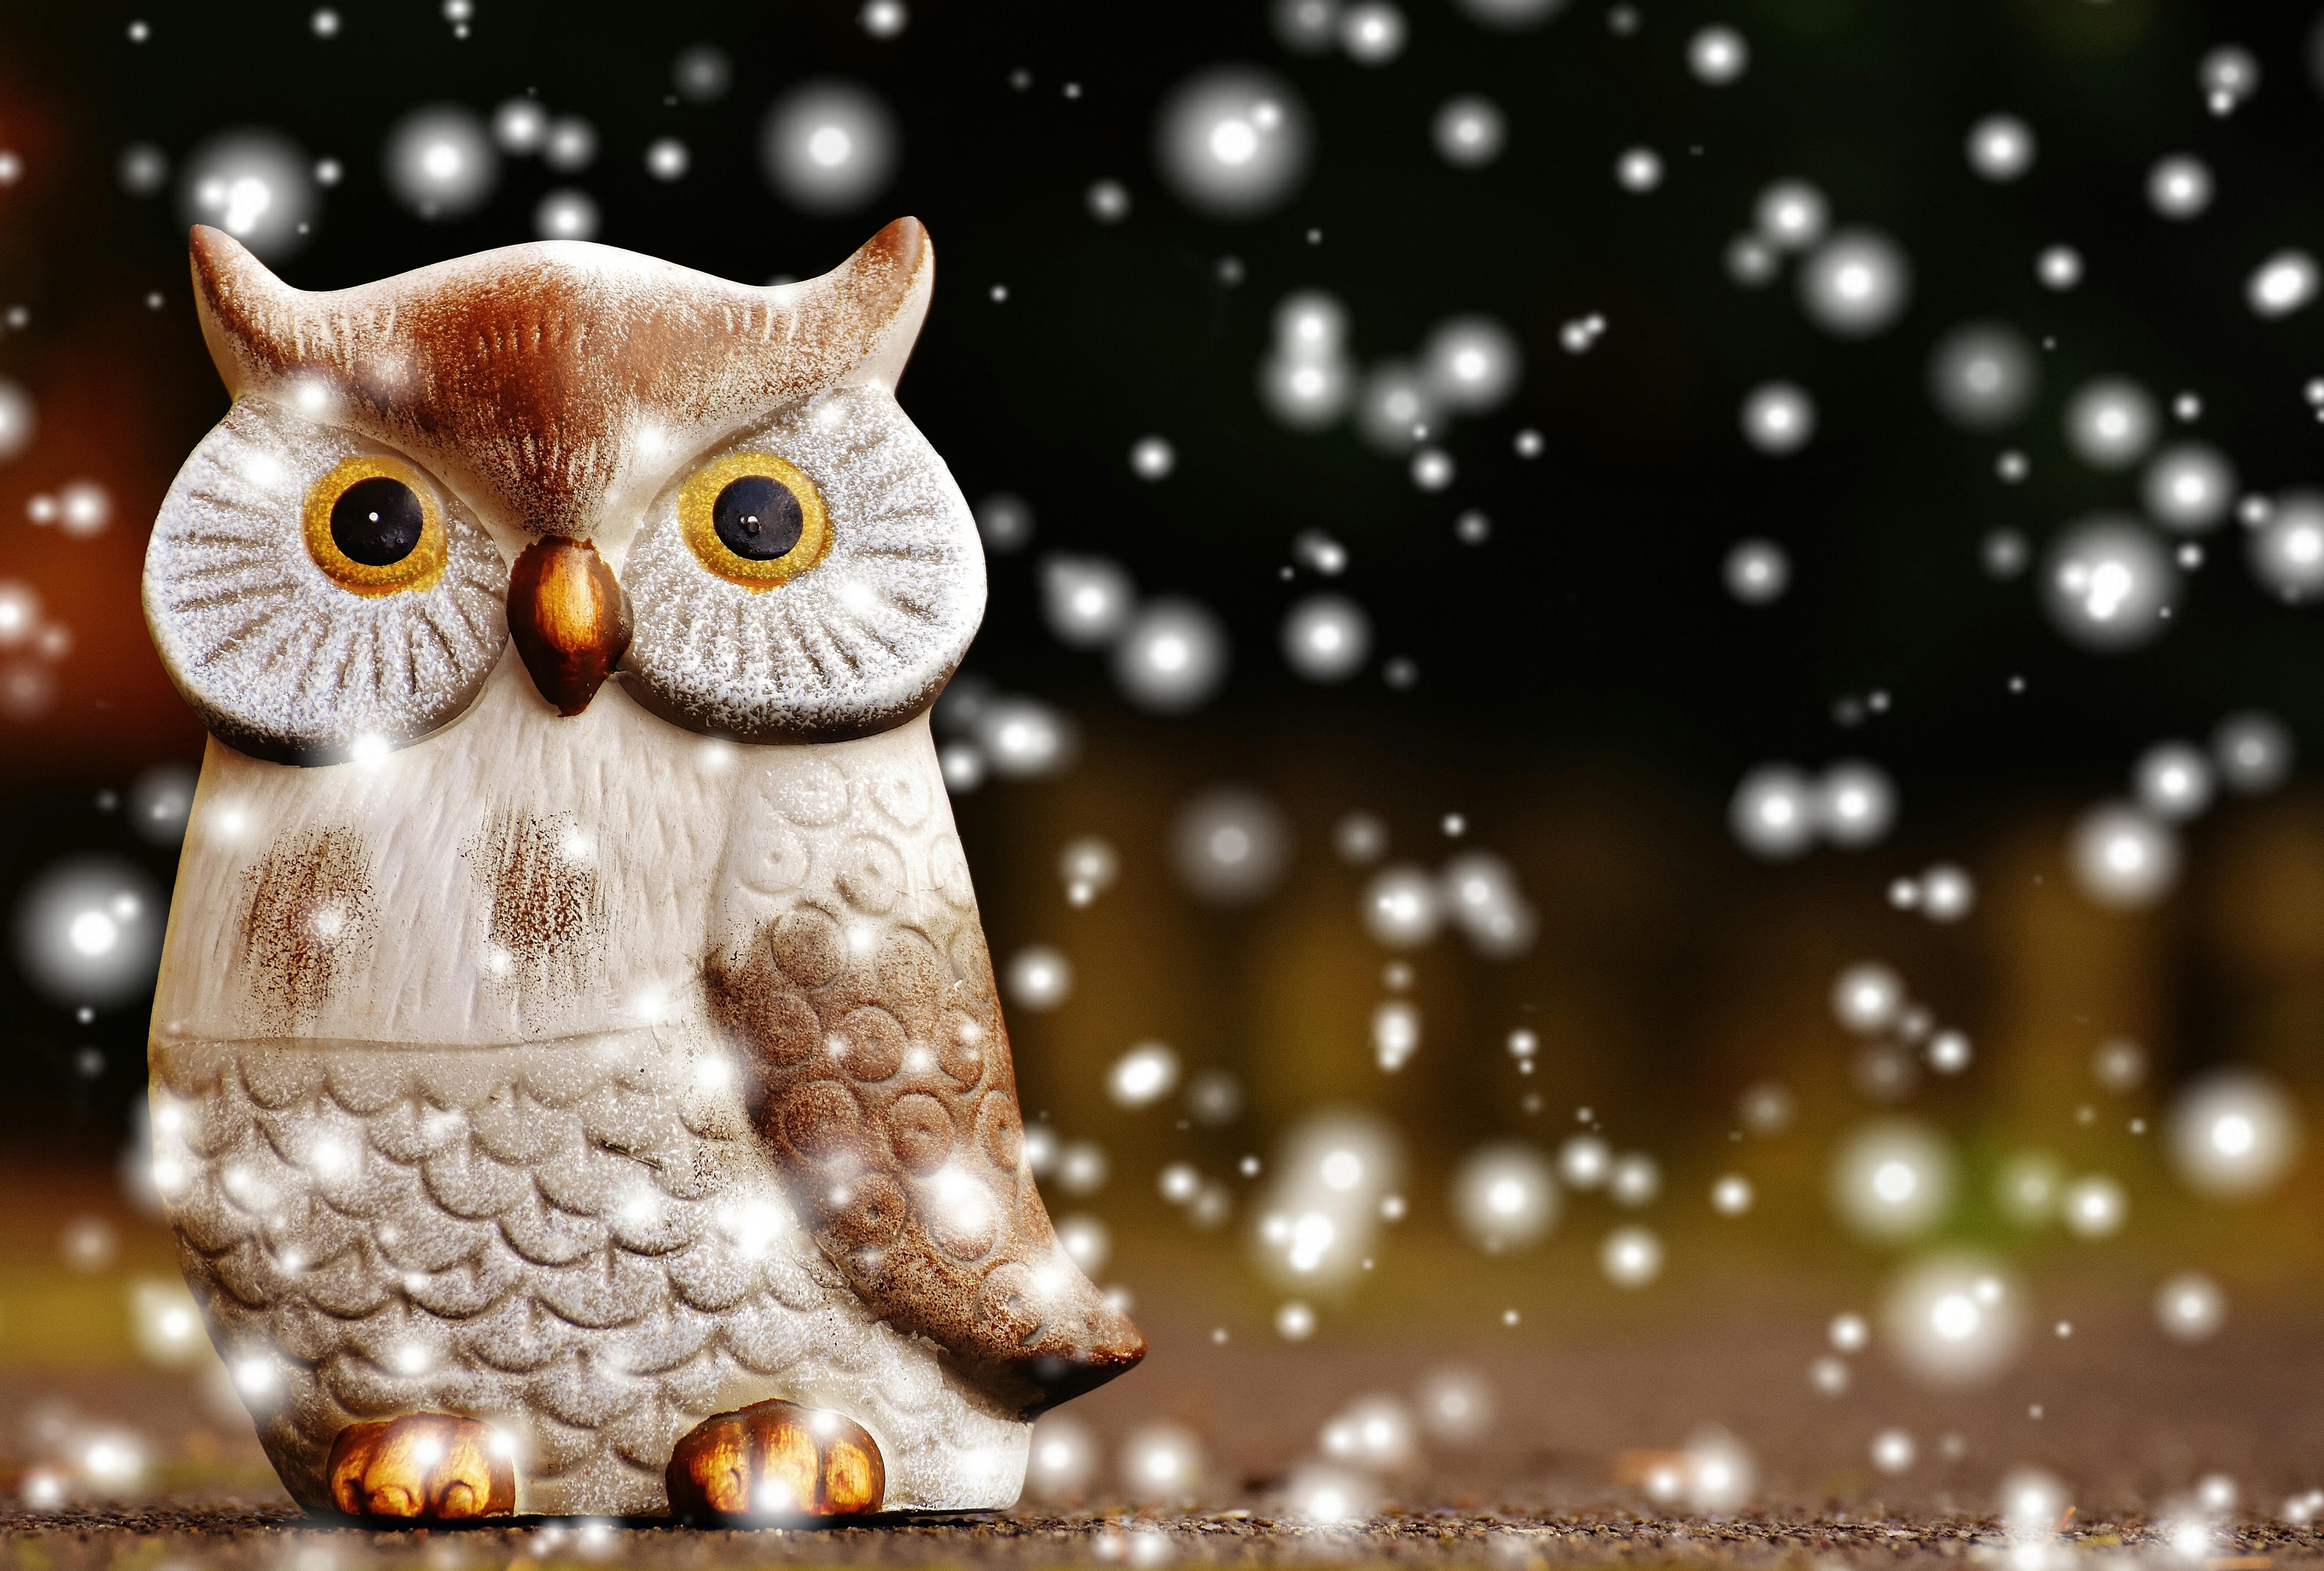 owl winter bird animal - photo #6